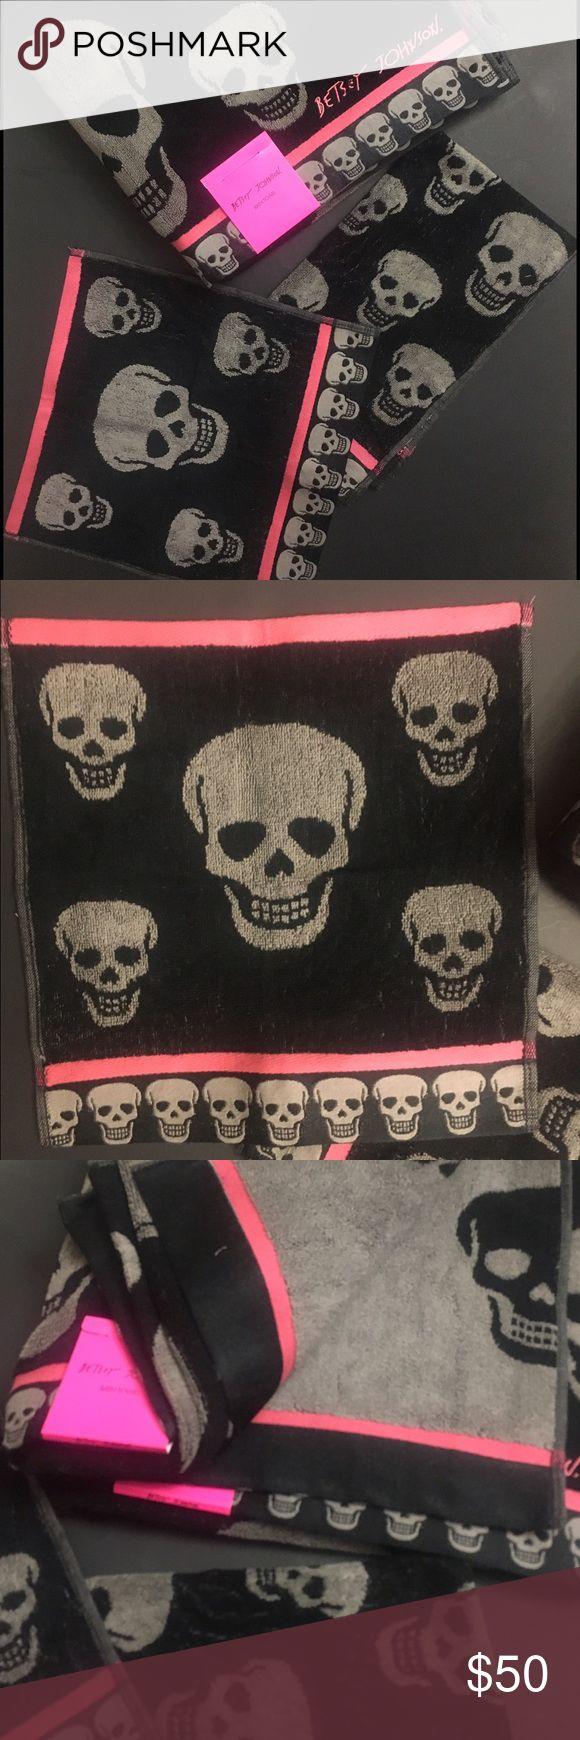 "Black Grey Pink Betsey Johnson Skull Bath Towel Grey and black skull with pink trim skeleton skull towel set includes:  2 bath towels (28x54"")  1 hand towel (16"" x 28"") 1washcloth(13x13"") Betsey Johnson Accessories"